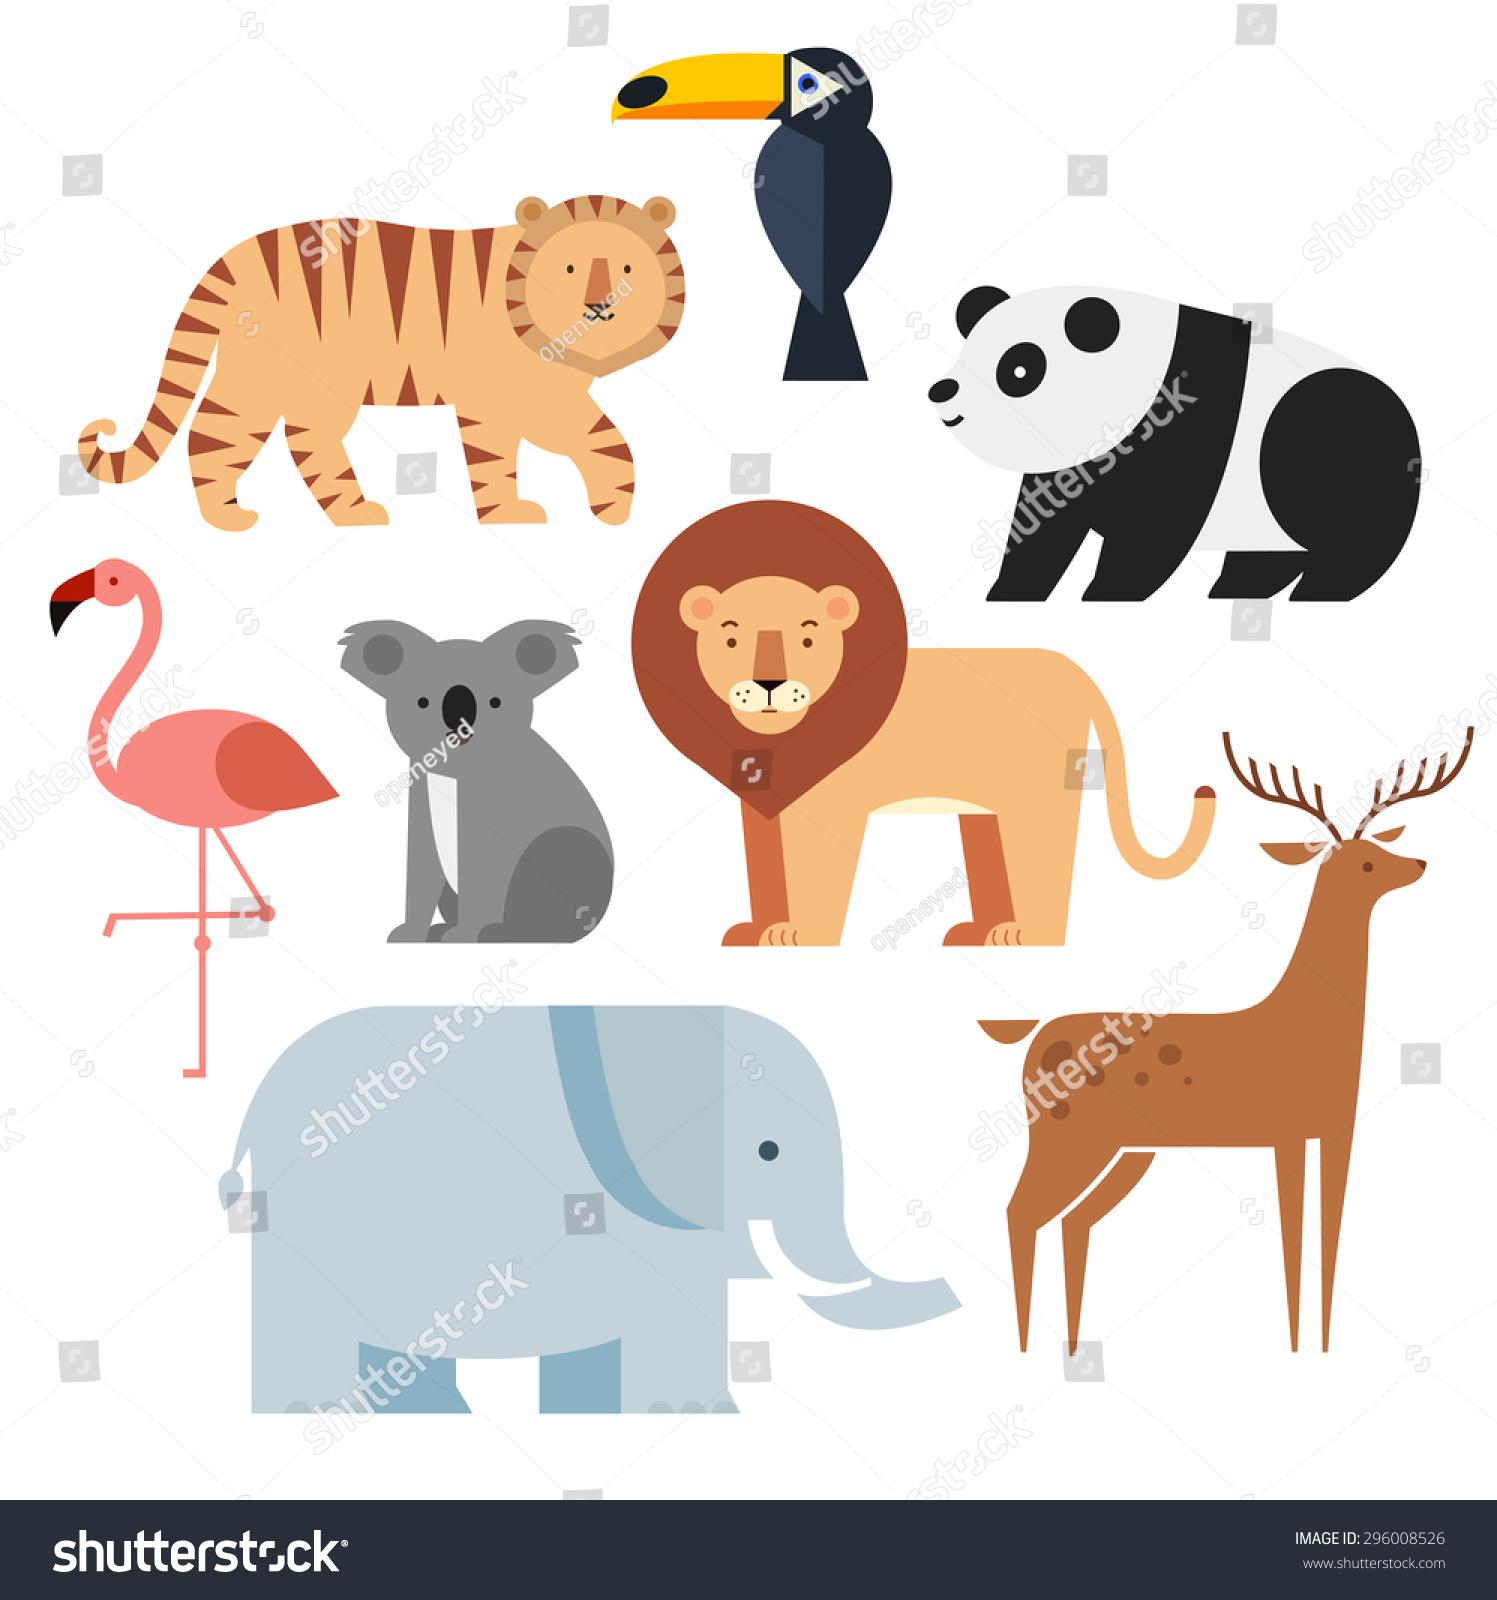 Vector illustration of cute animal set including panda lion deer tiger flamingo koala elephant and toucan